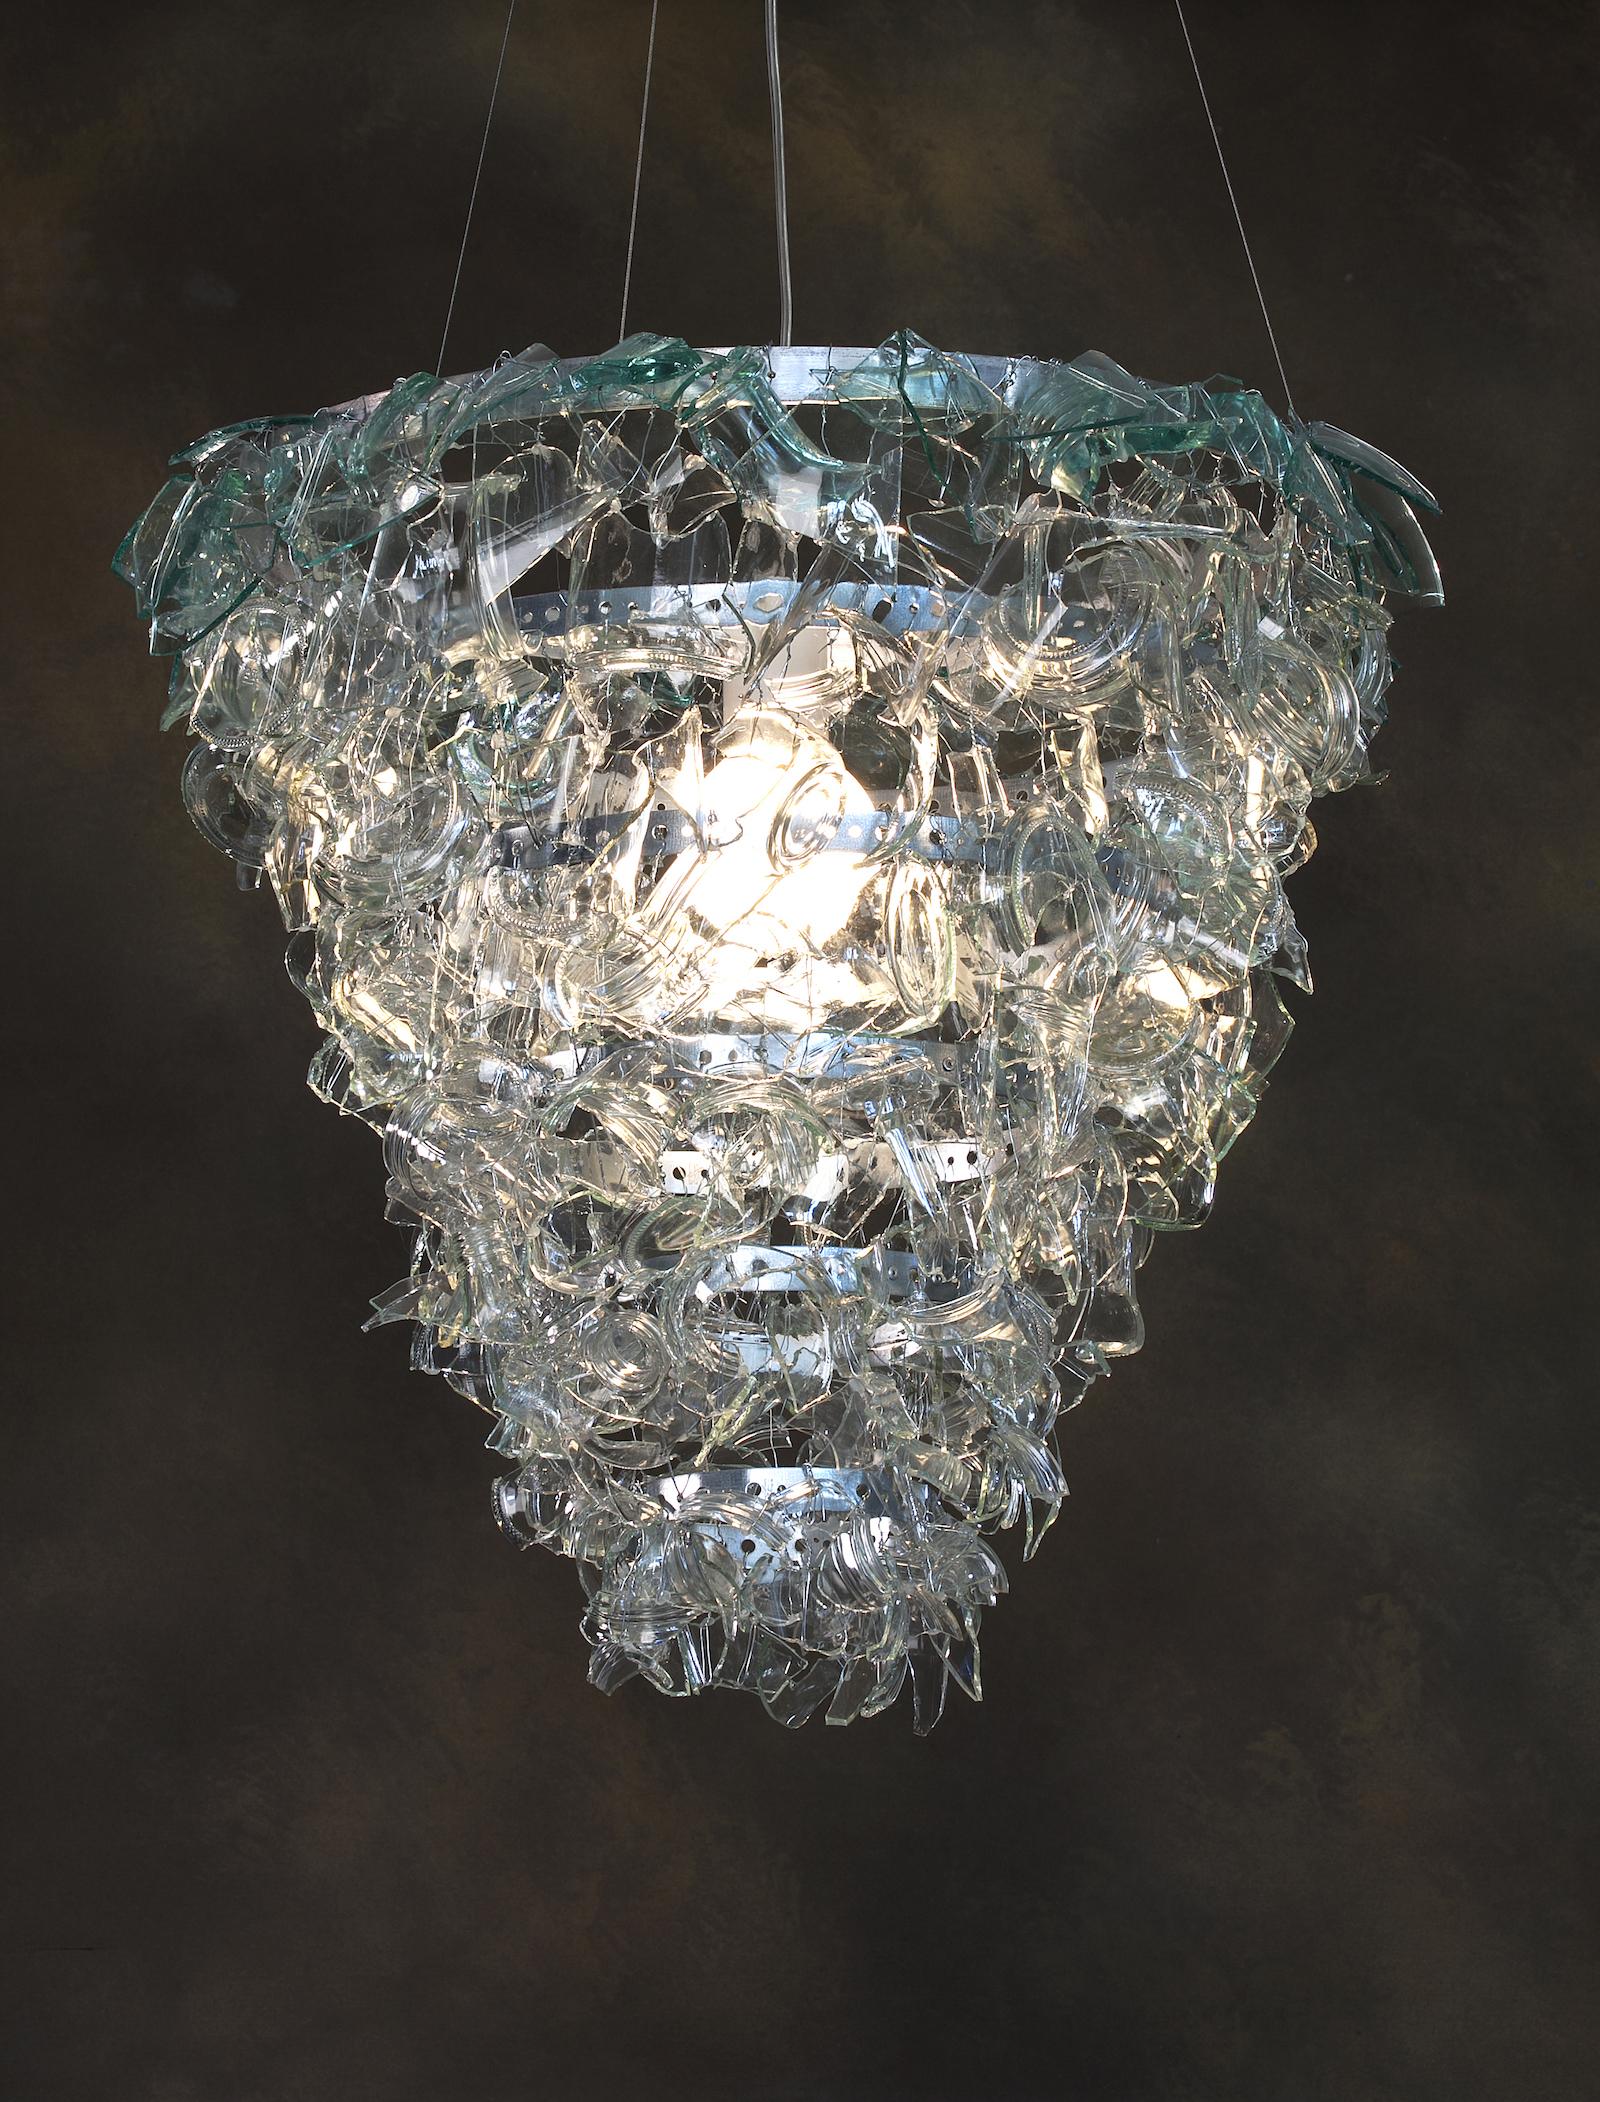 Large chandelier made of broken glass